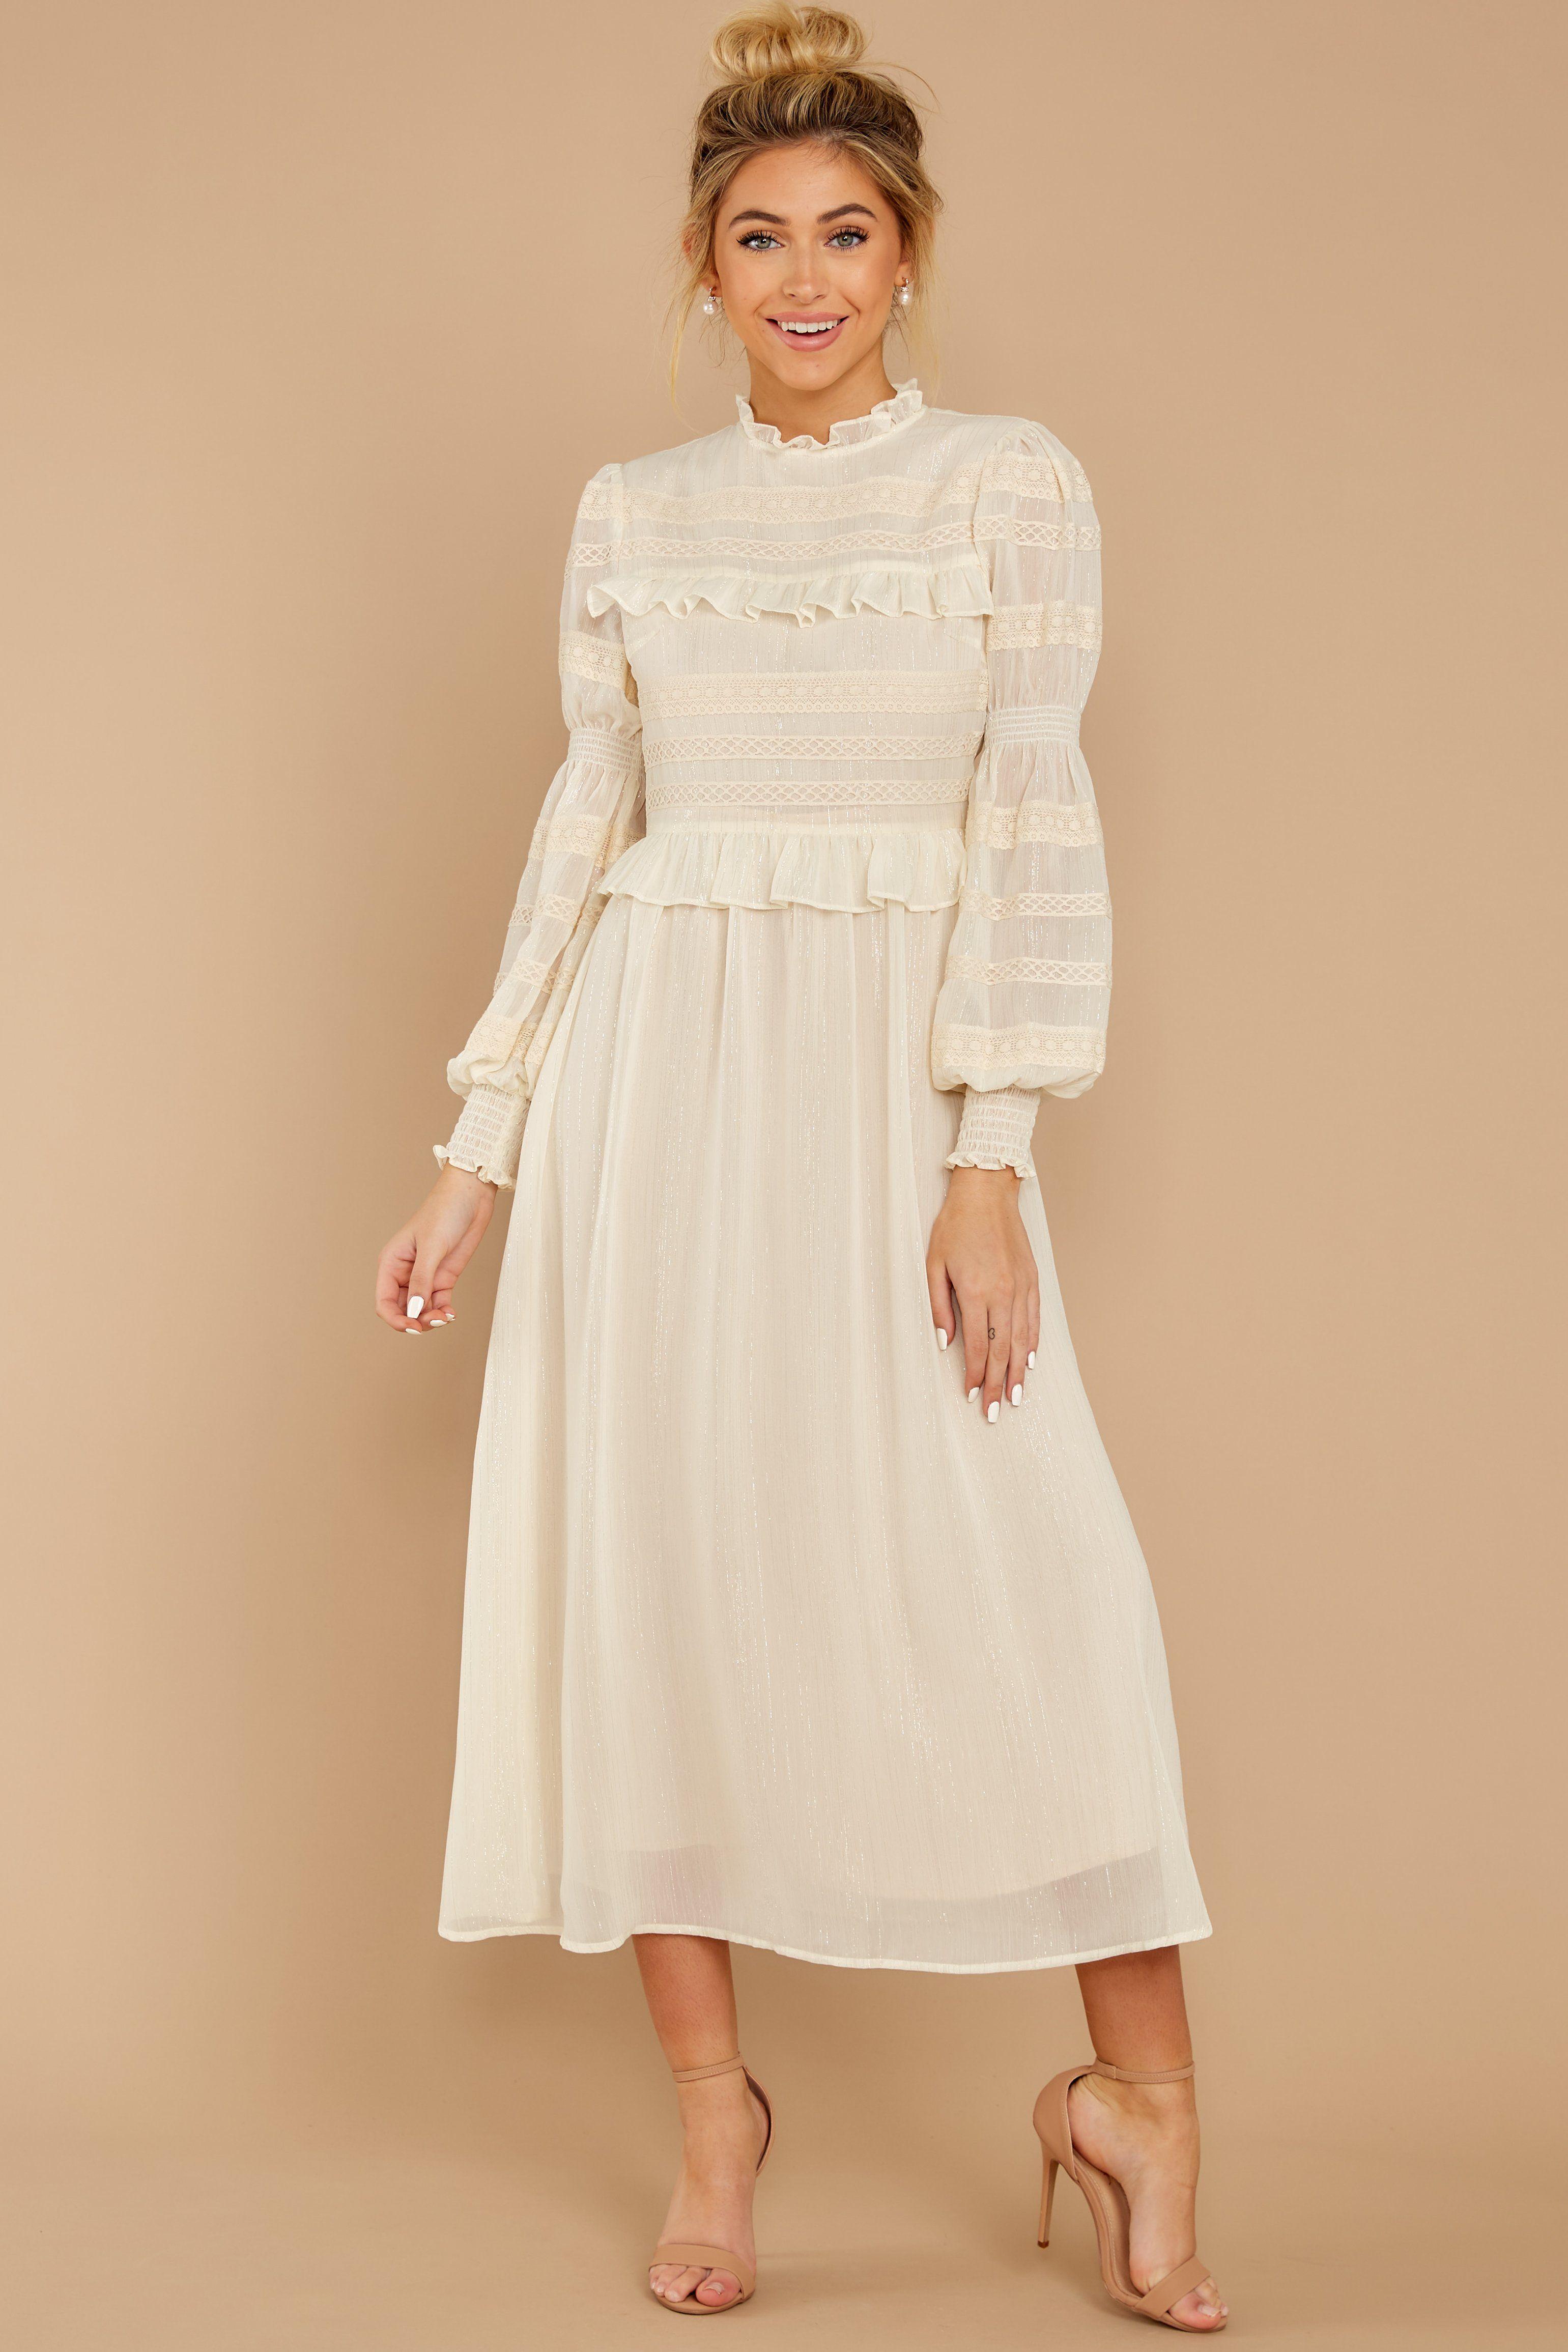 Simply Wishing For Ivory Midi Dress Dresses White Long Sleeve Dress Ivory Midi Dresses [ 4621 x 3081 Pixel ]